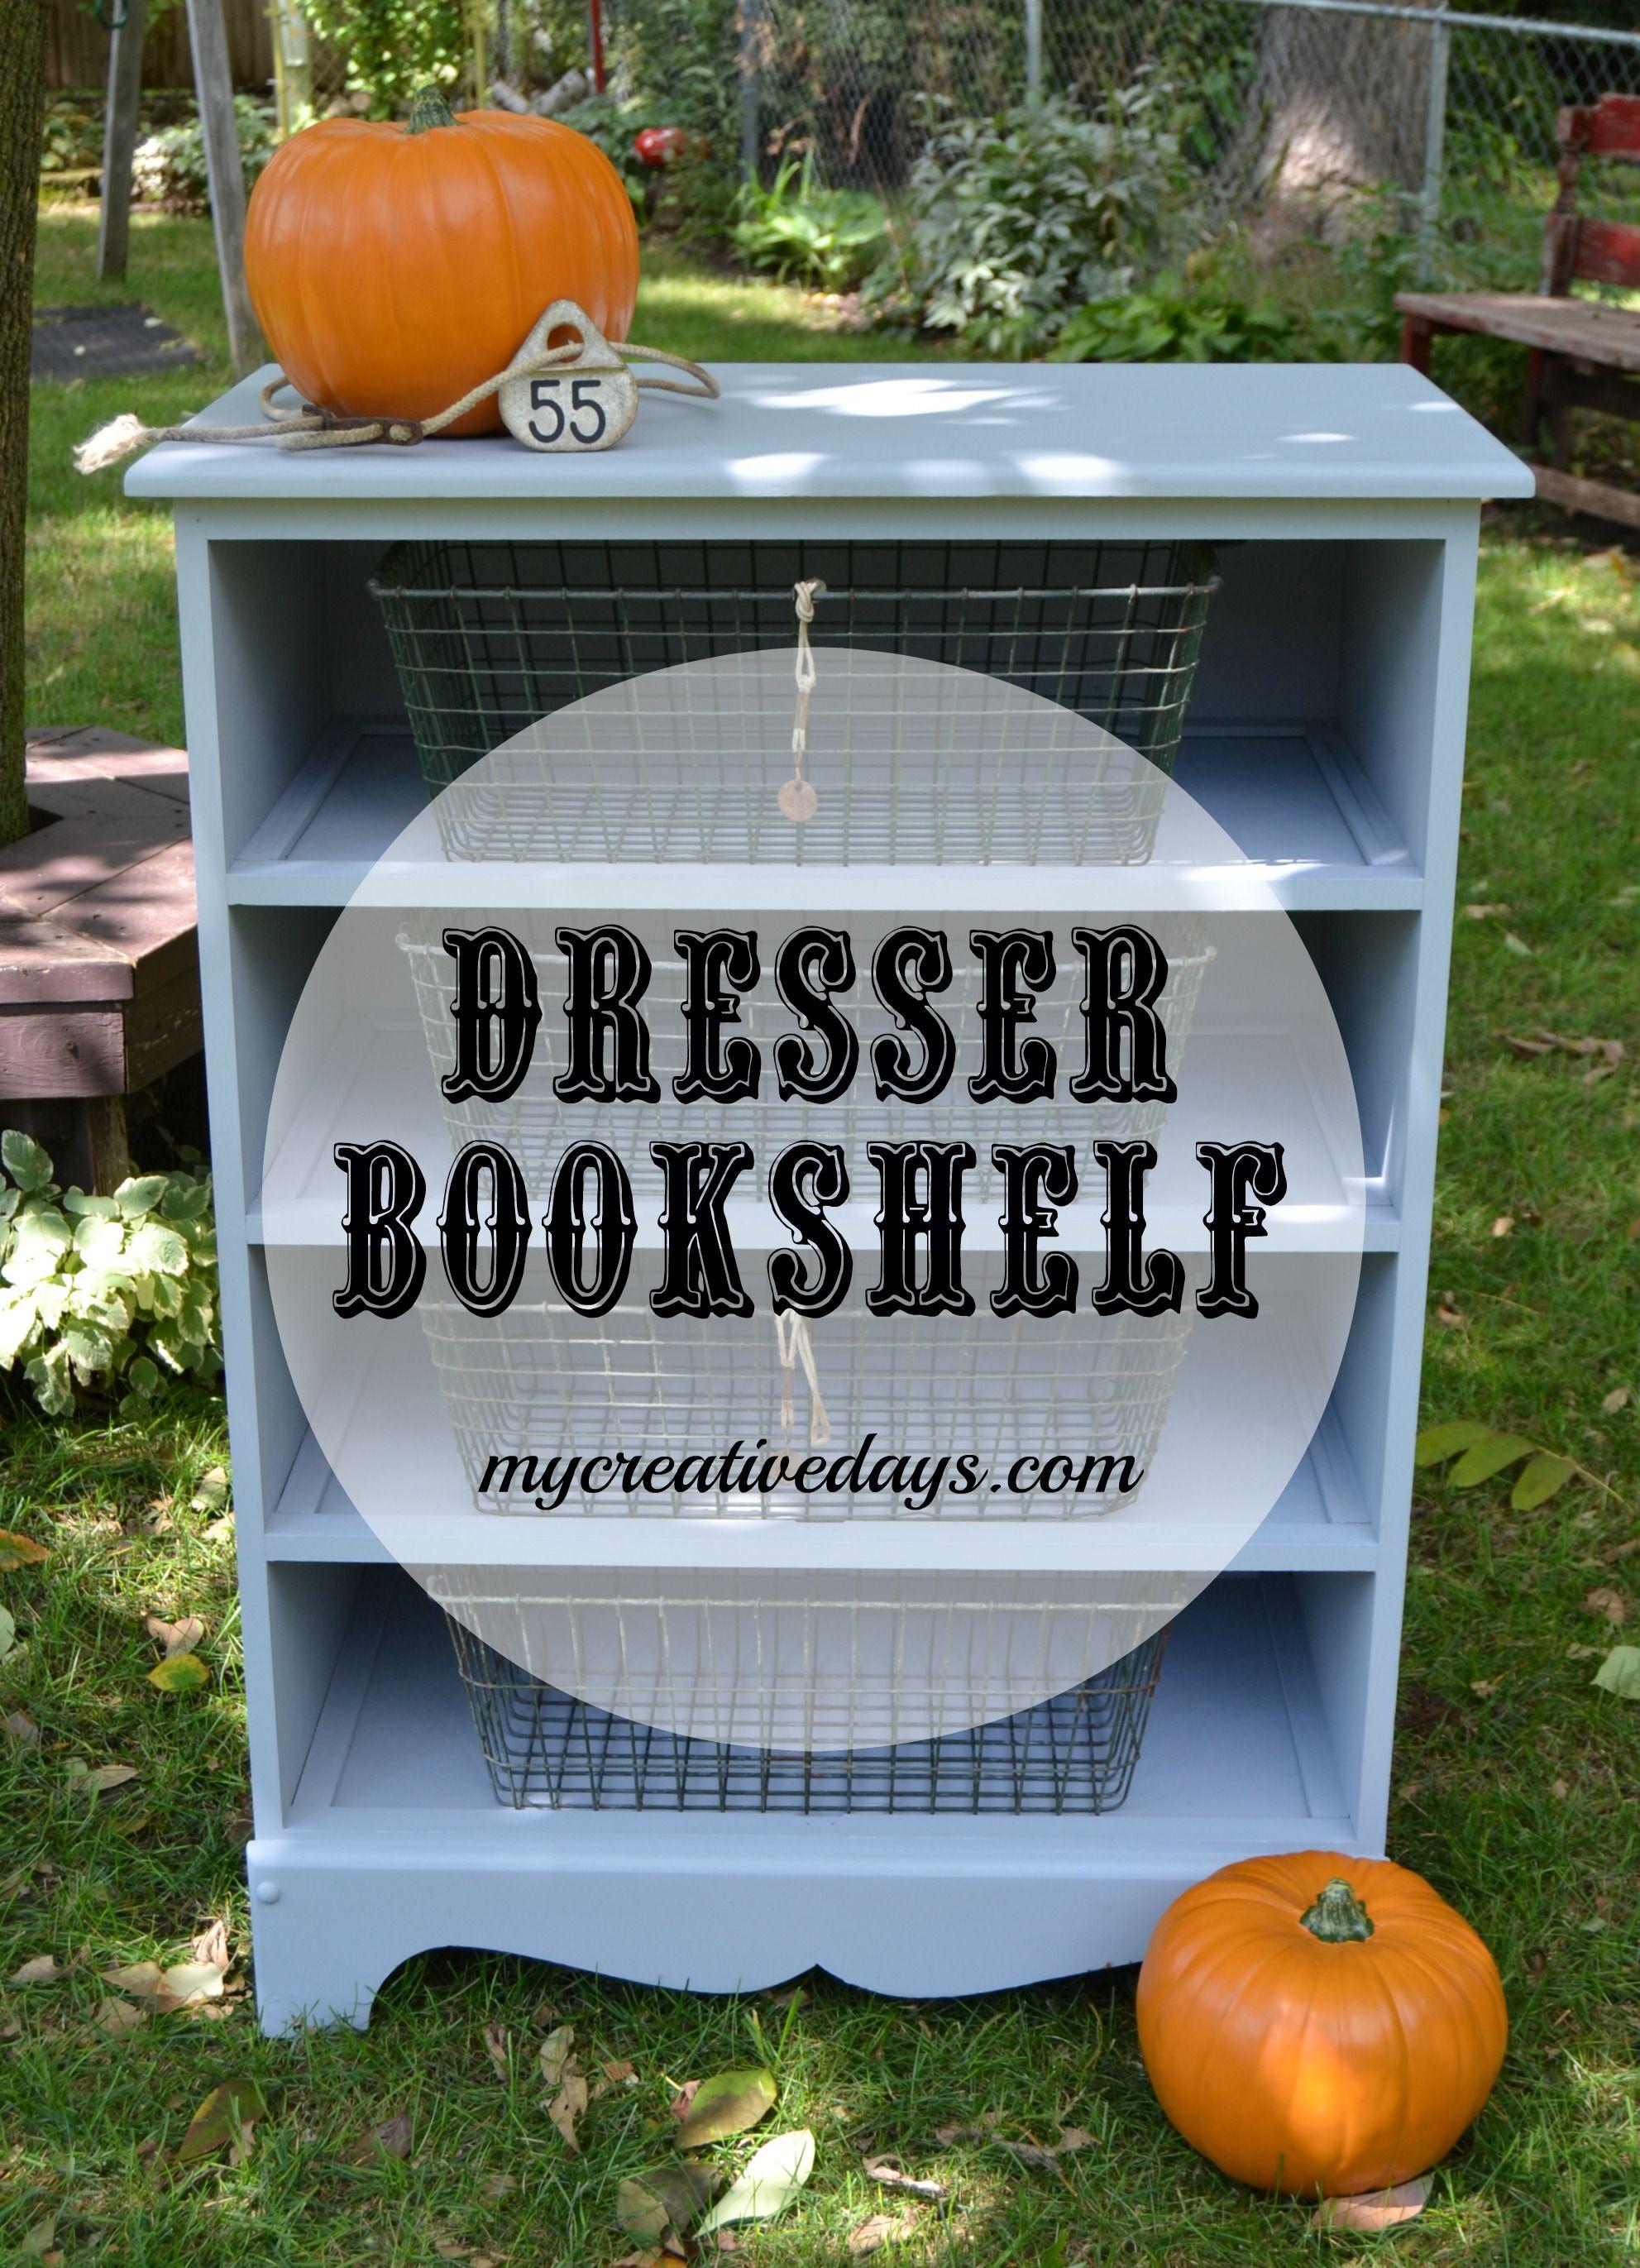 Dresser Bookshelf - CCP Transformation mycreativedays.com#paintedfurniture #hometalkeveryday #repurposeddresser